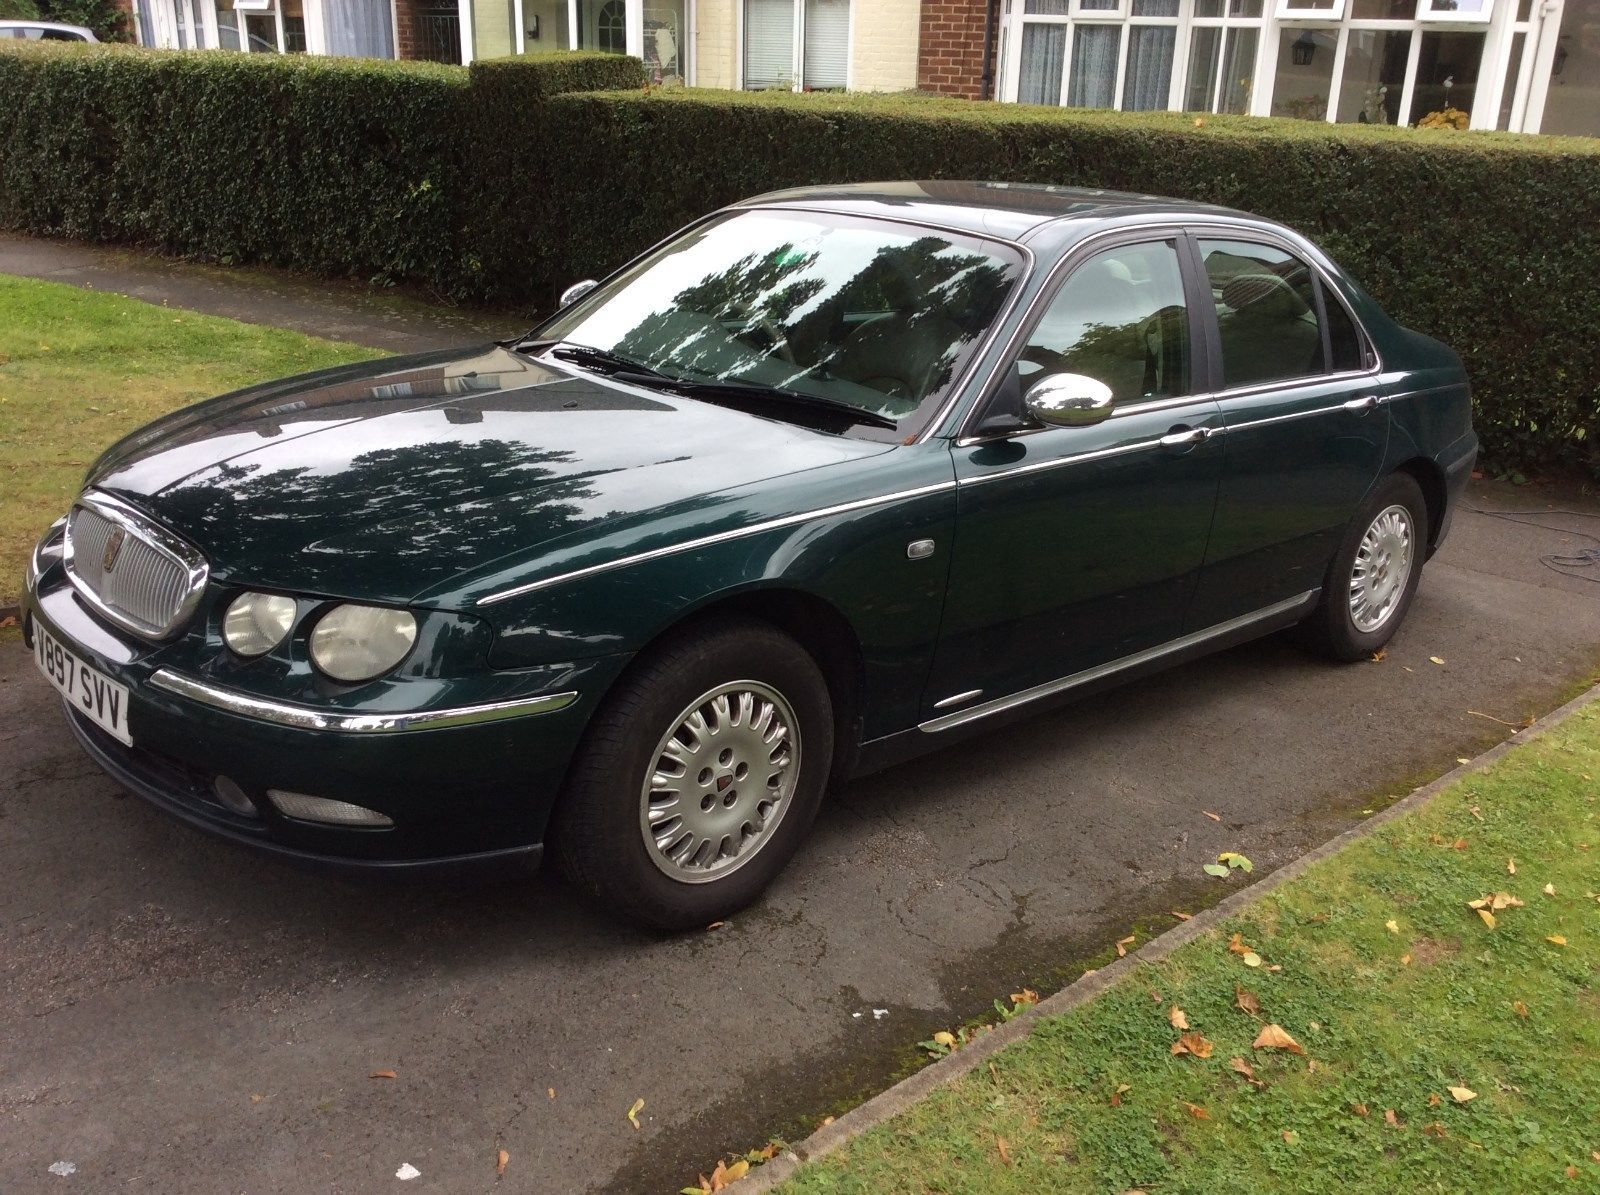 1999 Rover 75 2.5L V6 Connoisseur - Selling for Spares - No Mot ...